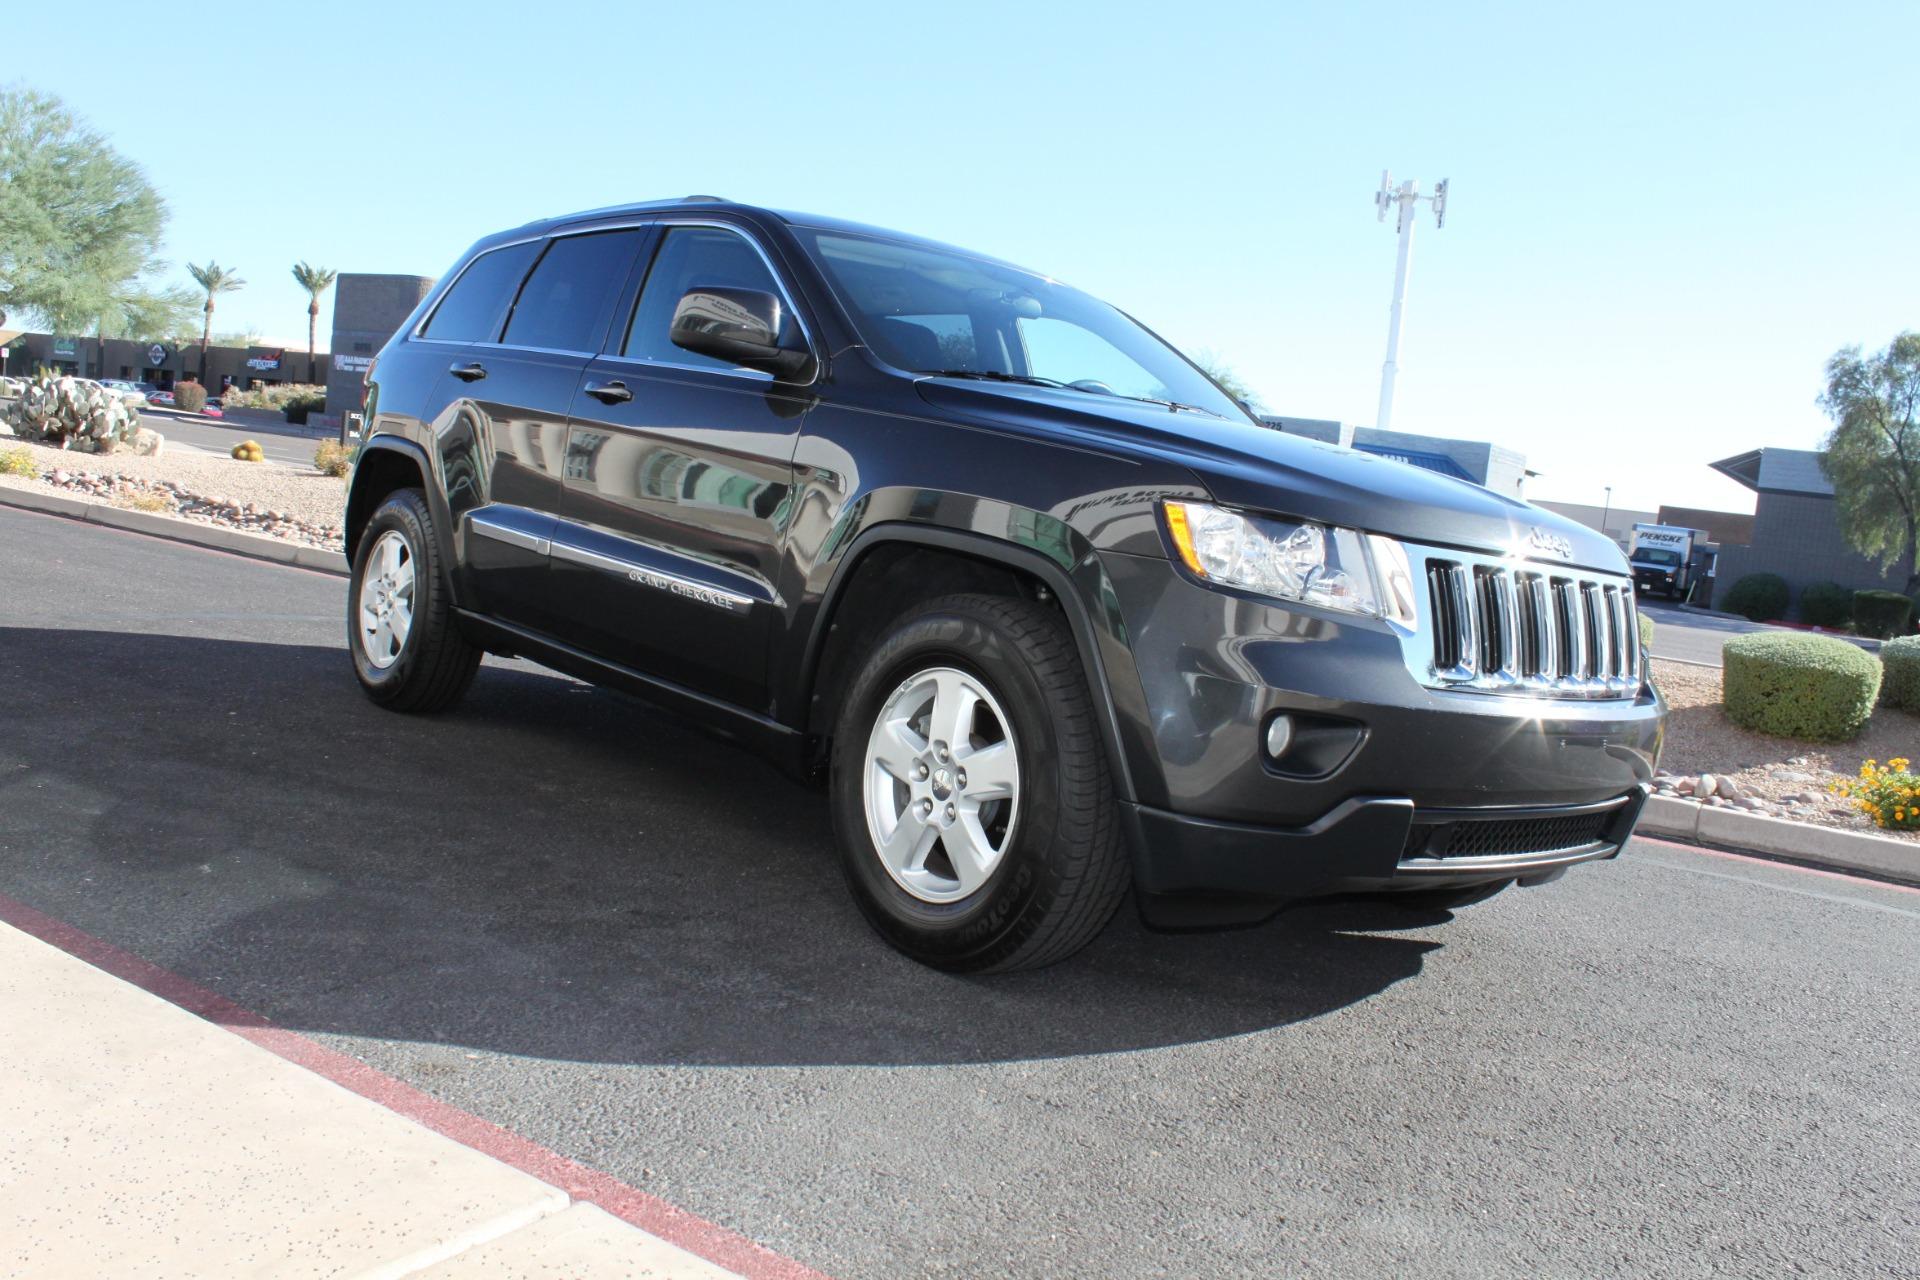 Used-2011-Jeep-Grand-Cherokee-Laredo-Chevrolet